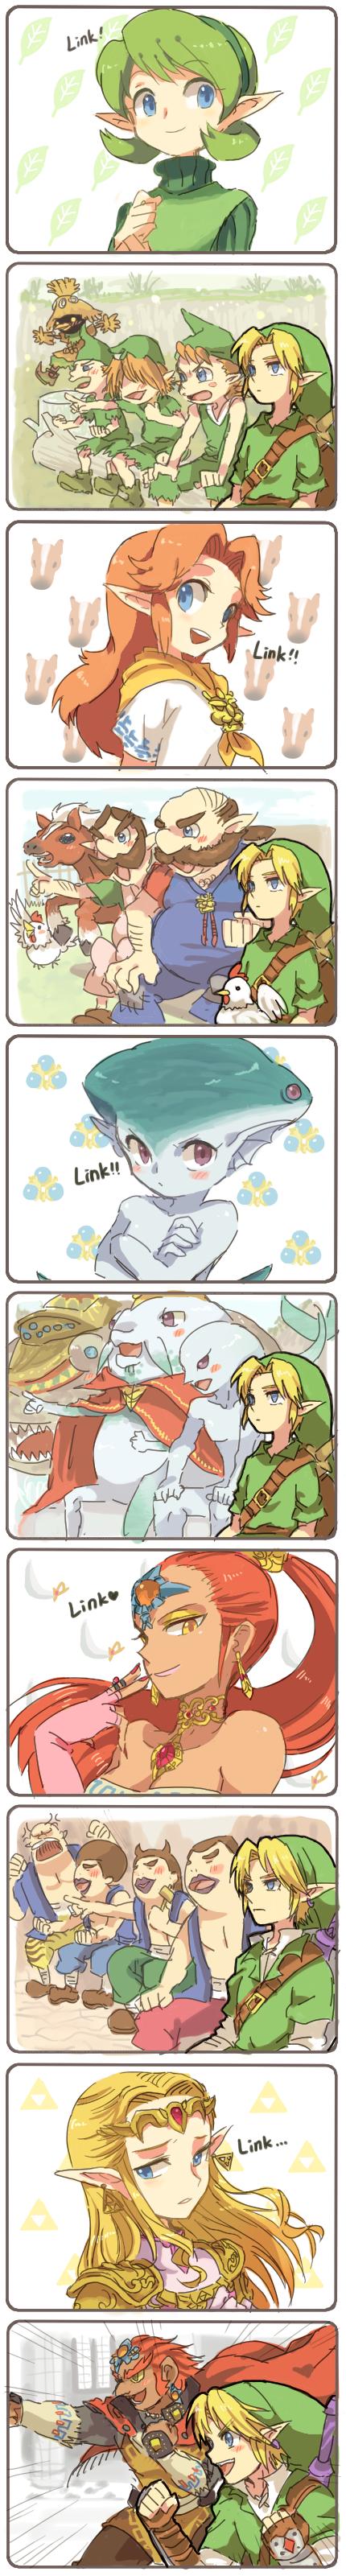 Reaction Link by KIRU75